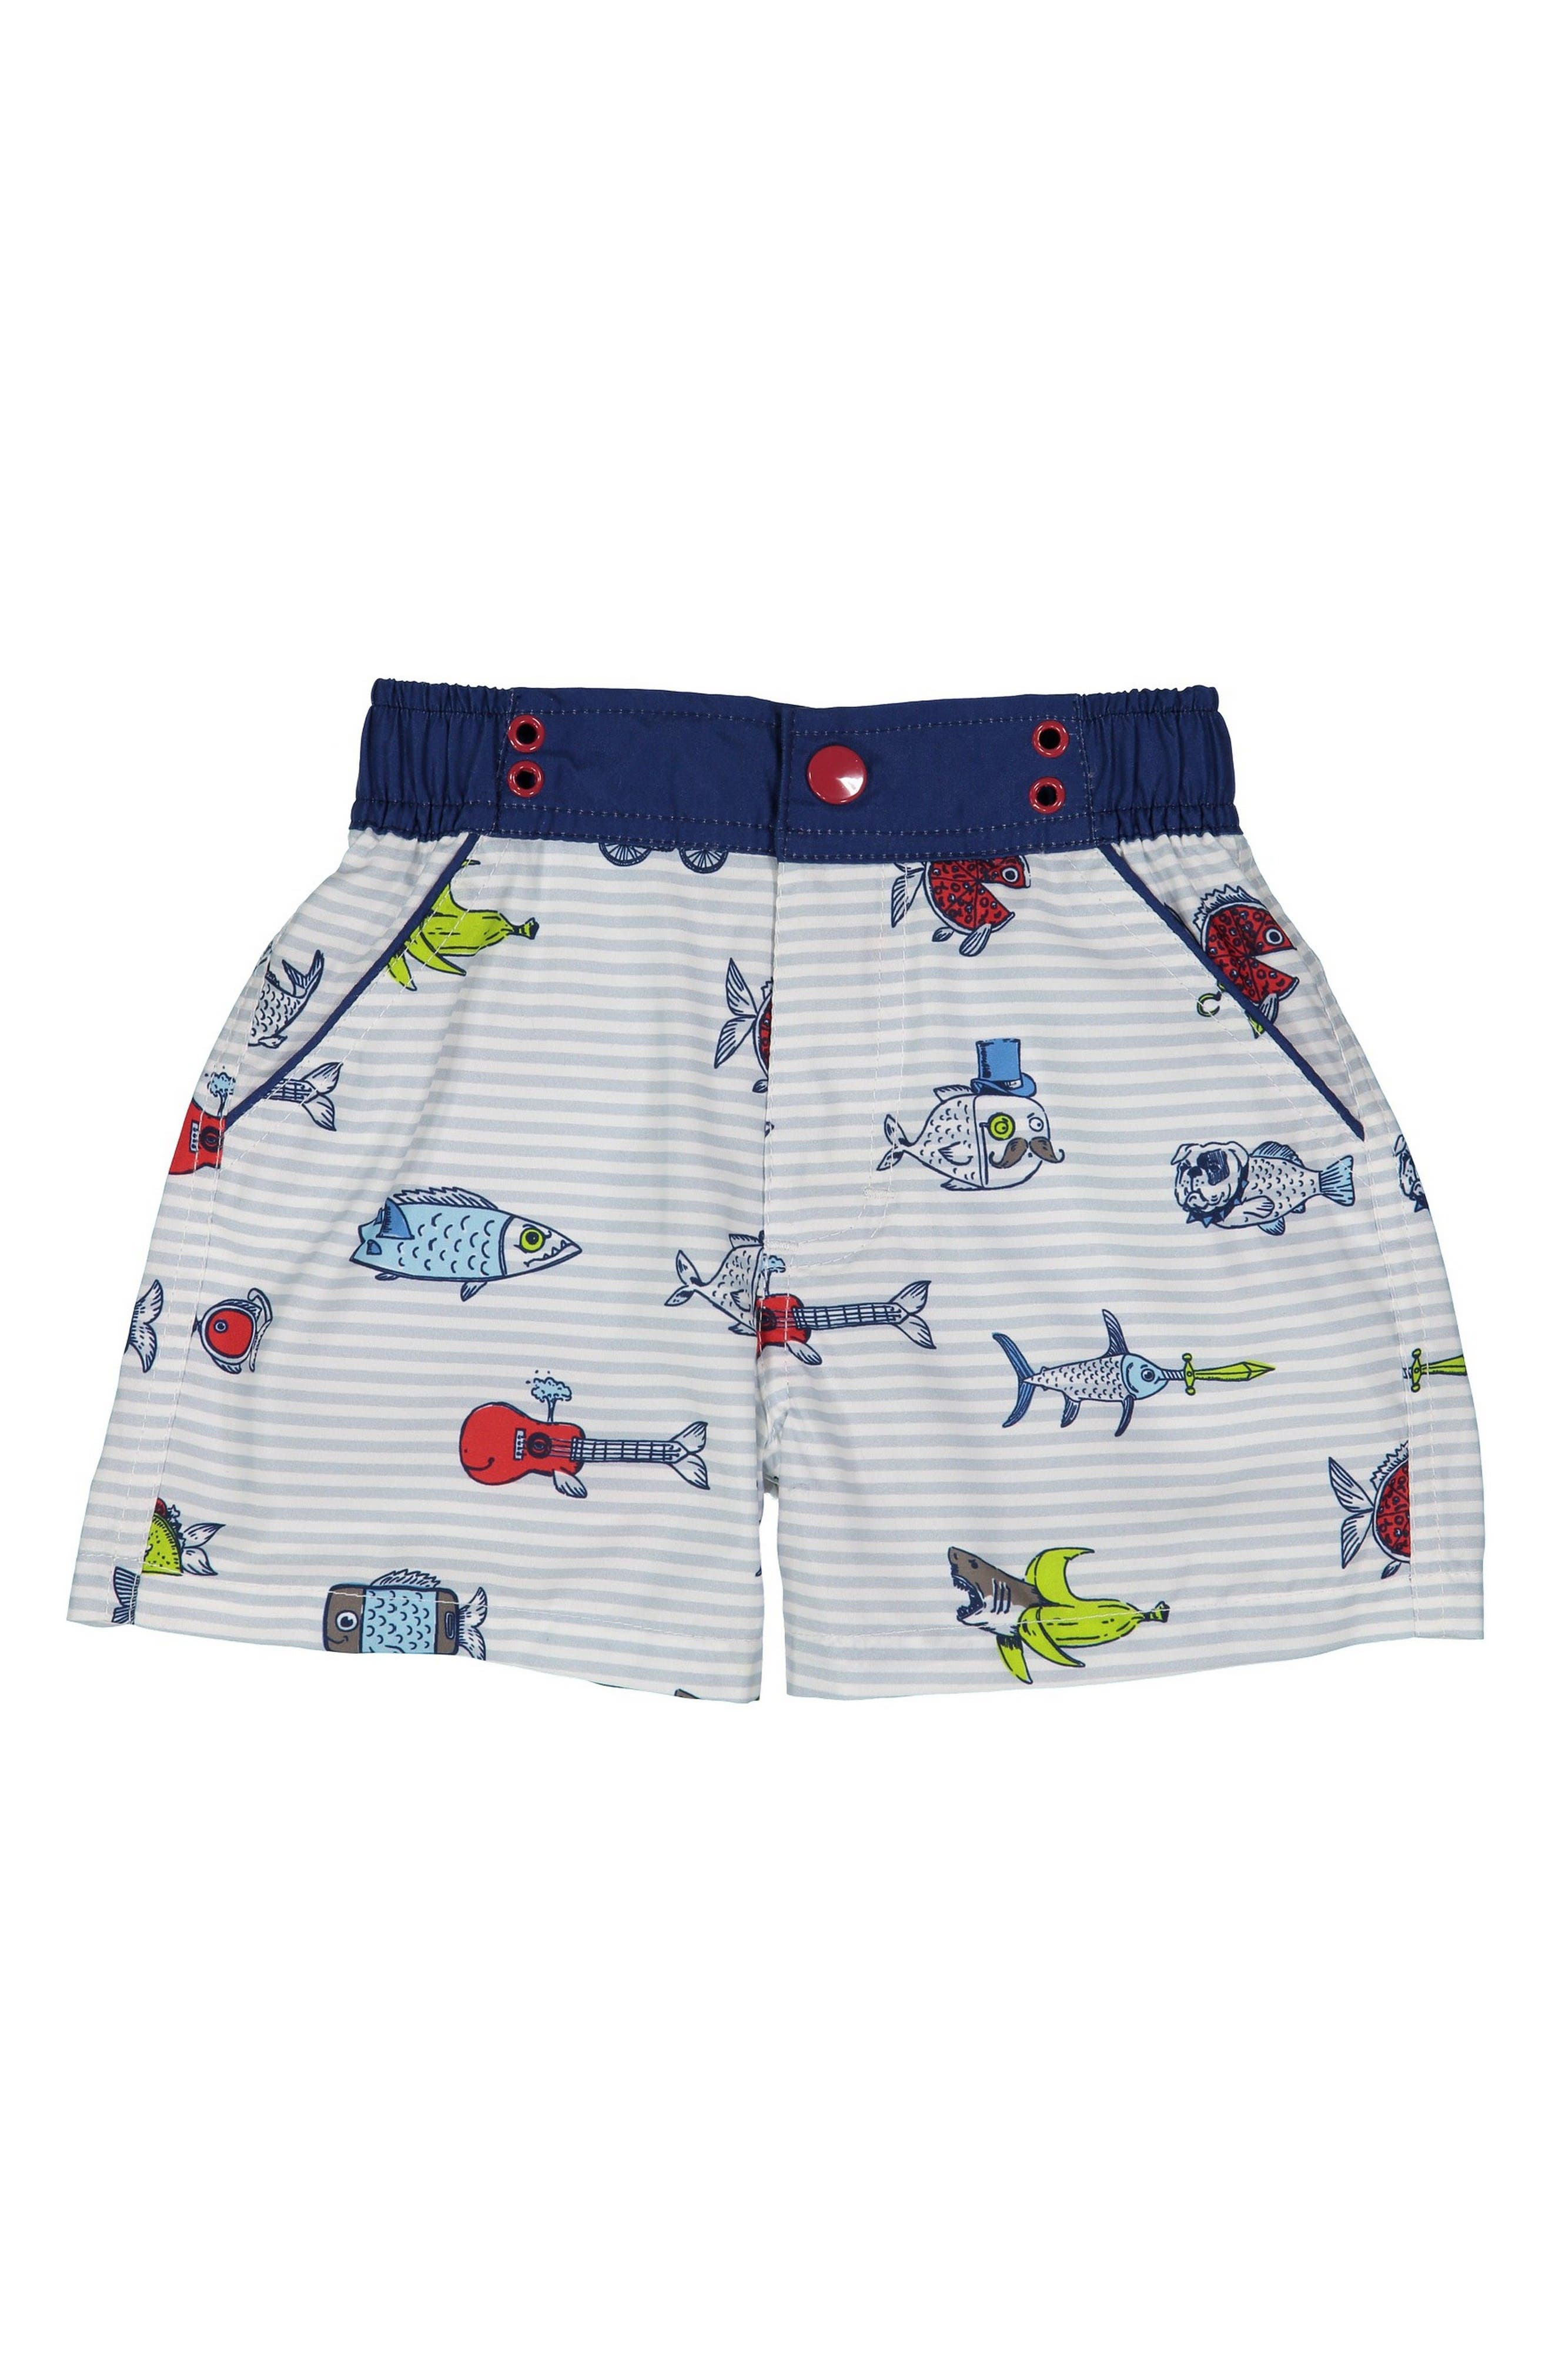 Main Image - Andy & Evan Fish Swim Trunks (Toddler Boys & Little Boys)